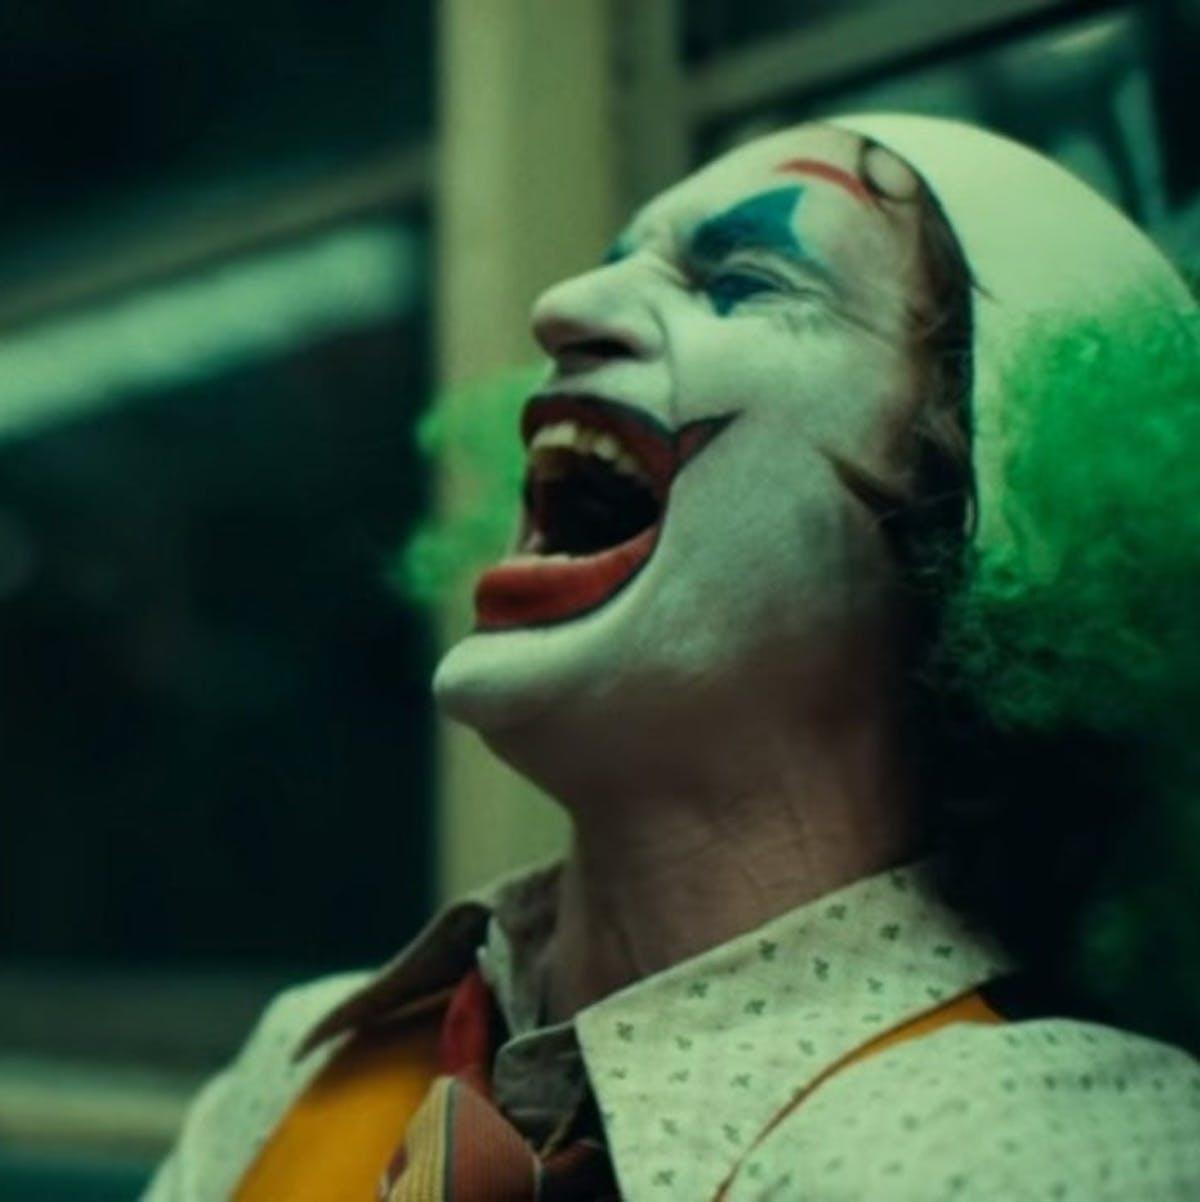 'Joker 2' could happen with right sequel script, says Joaquin Phoenix